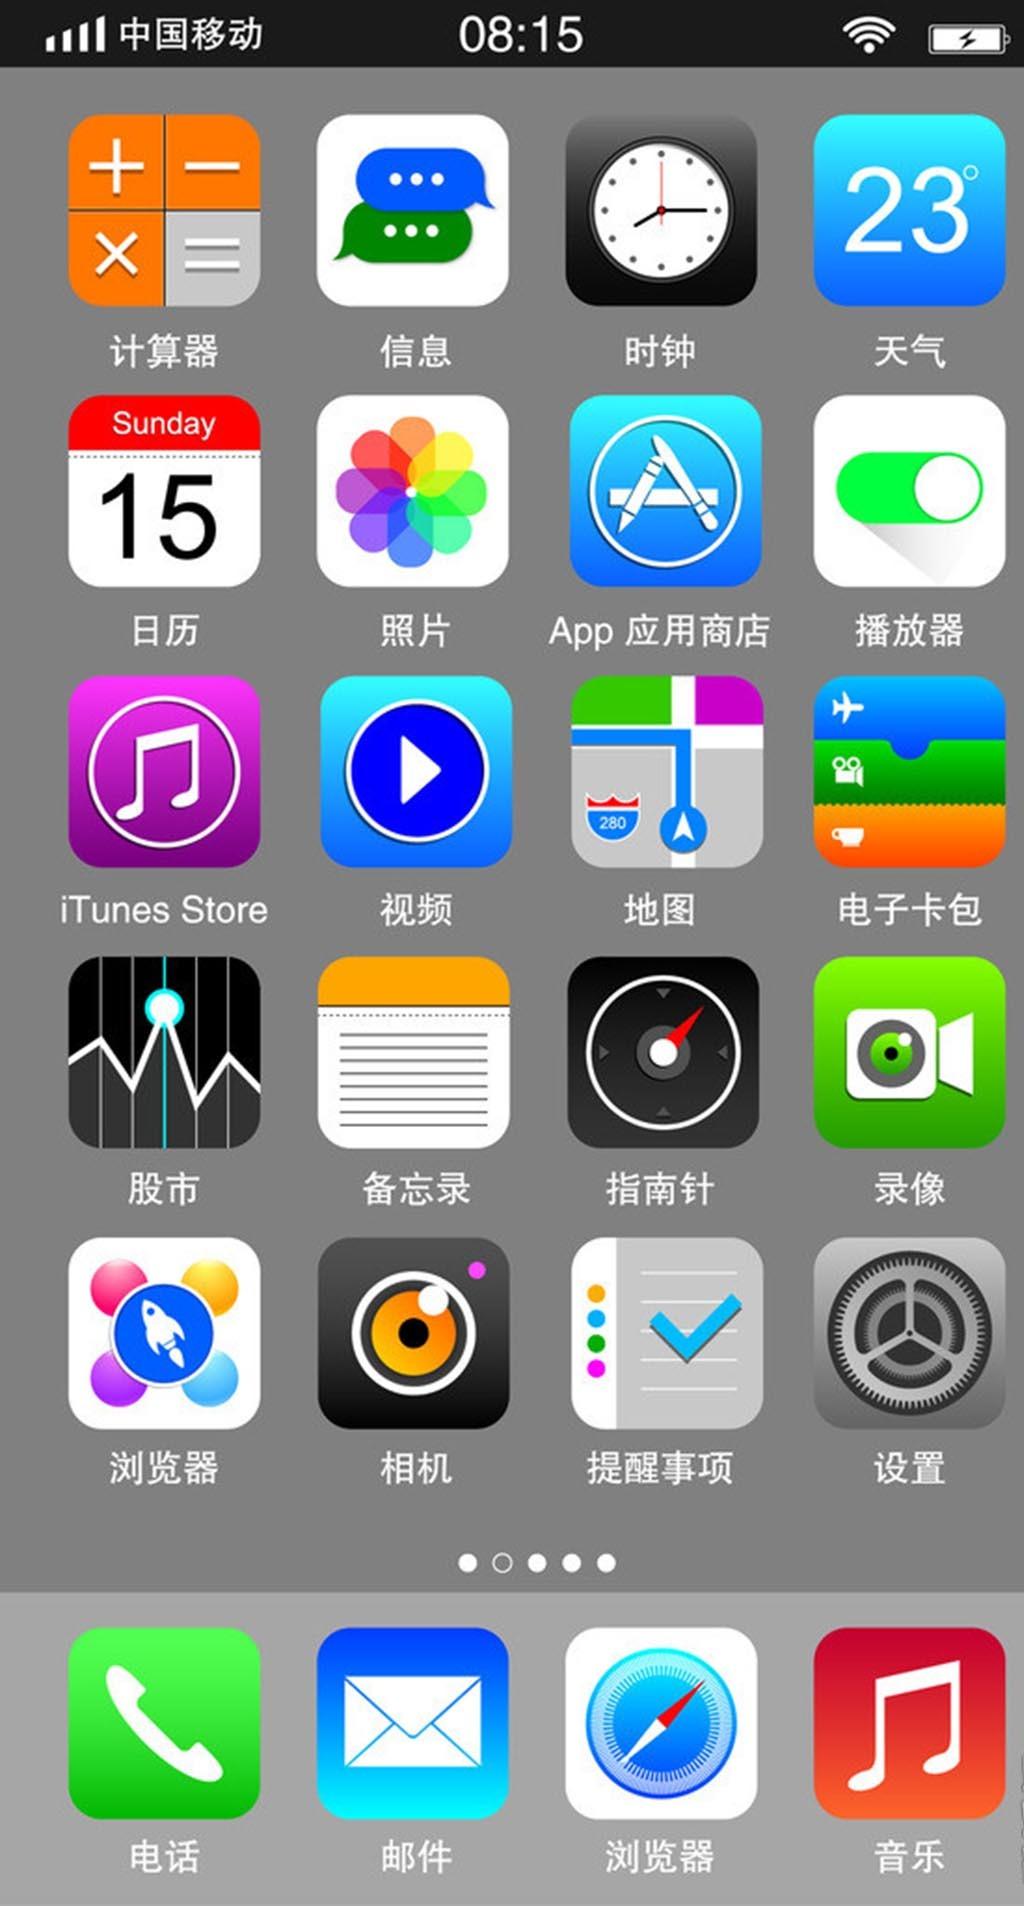 ipad 交互界面 图标设计 移动界面设计 矢量 ai  【声明】未经权利人